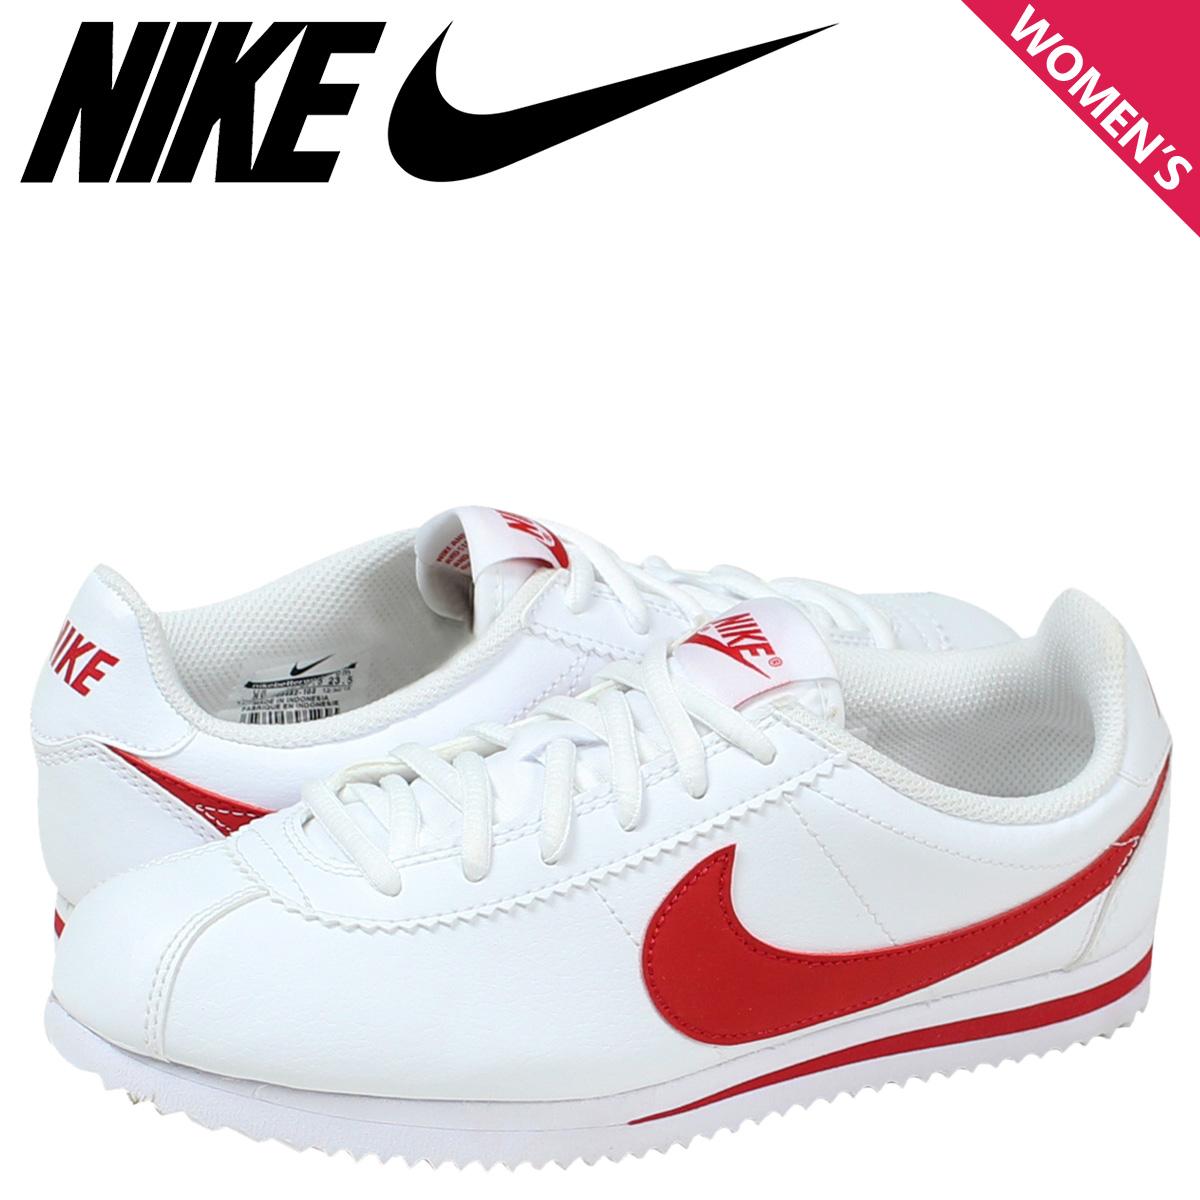 new arrival 0c849 7d7ba ALLSPORTS Nike NIKE Cortez sneakers Womens CORTEZ GS 749482-103 shoes  white  Rakuten Global Market